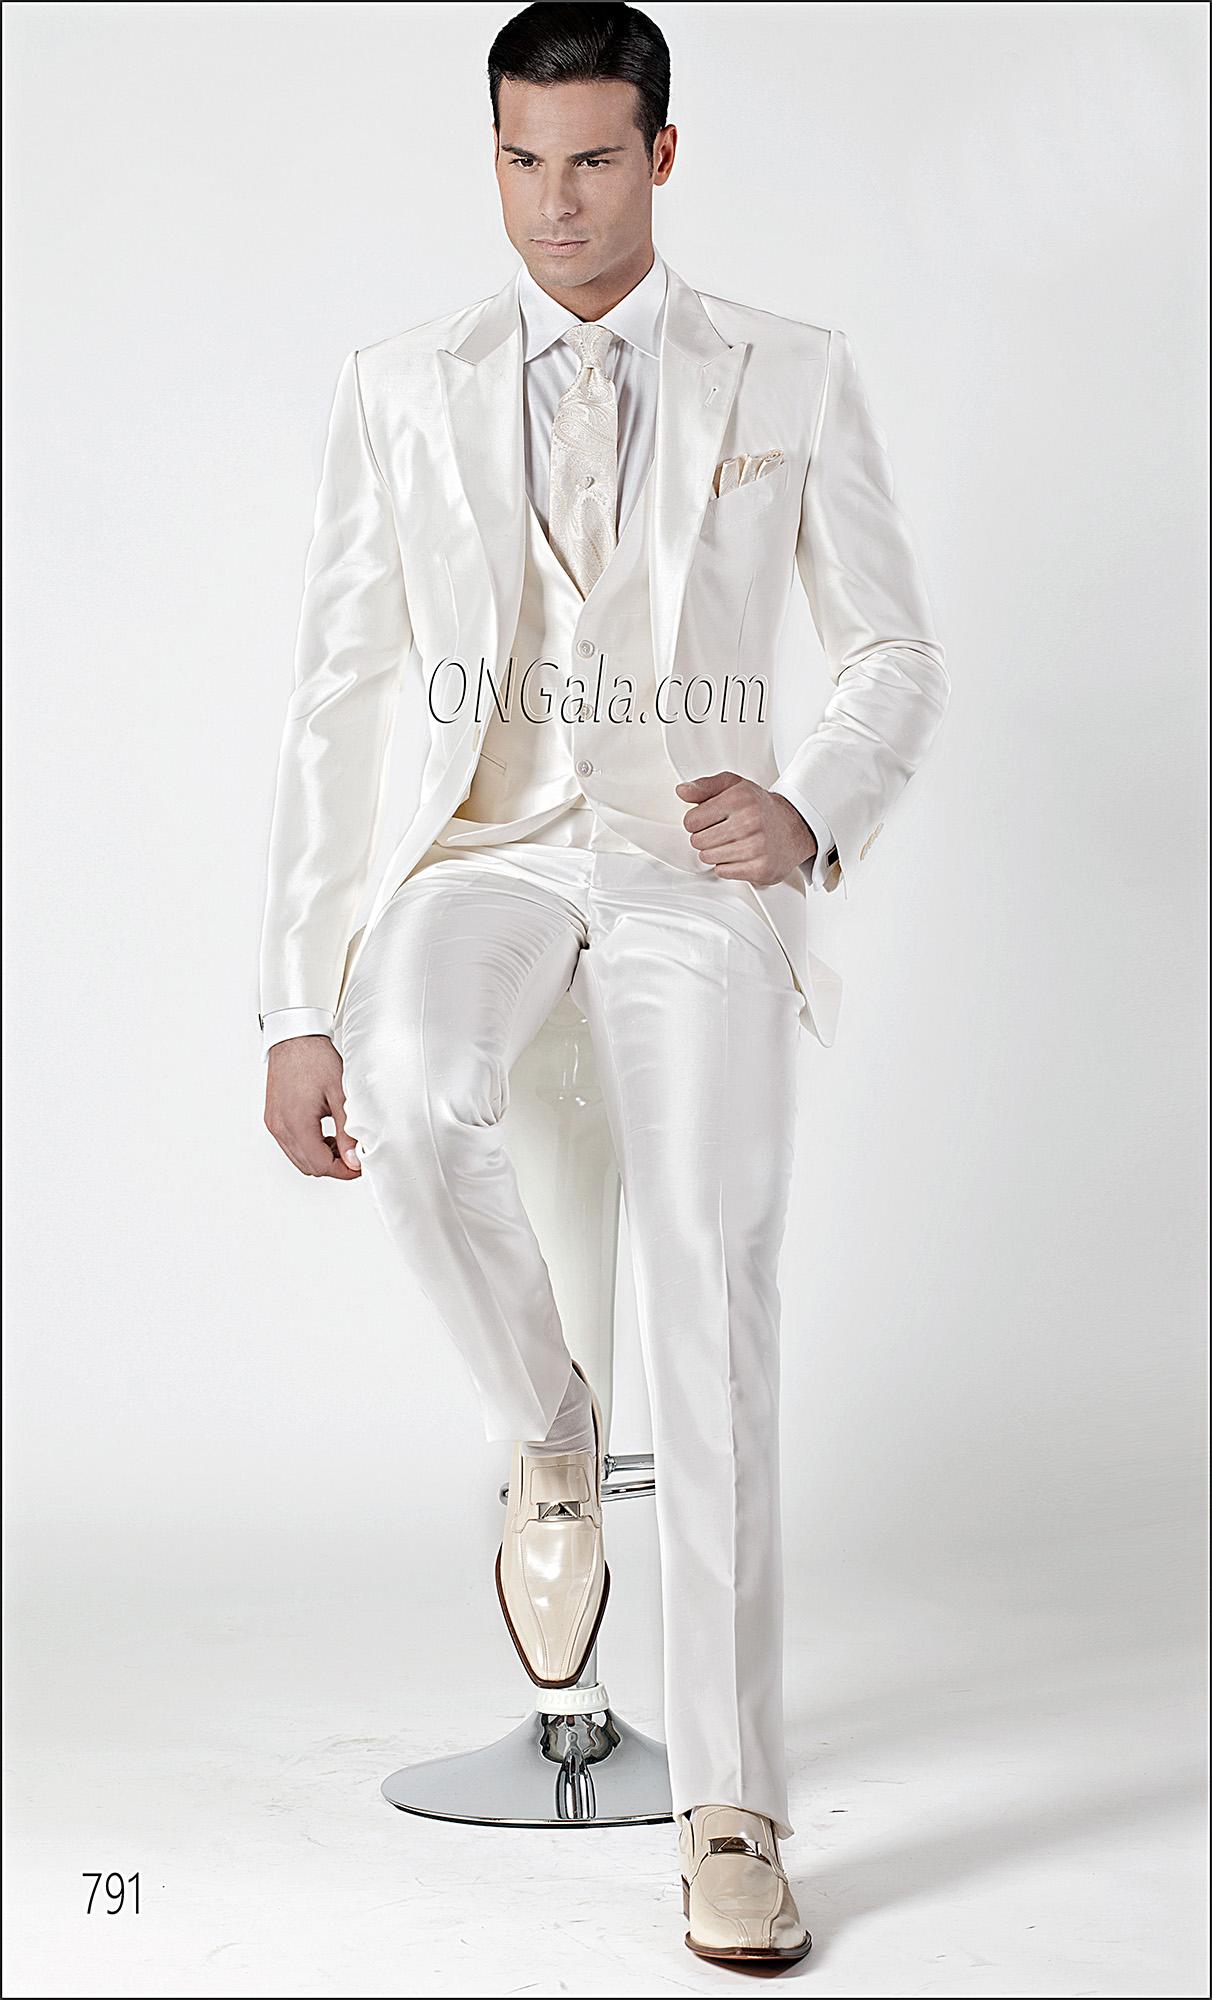 Matrimonio Uomo Bianco : Abito da cerimonia uomo in shantung misto seta bianco